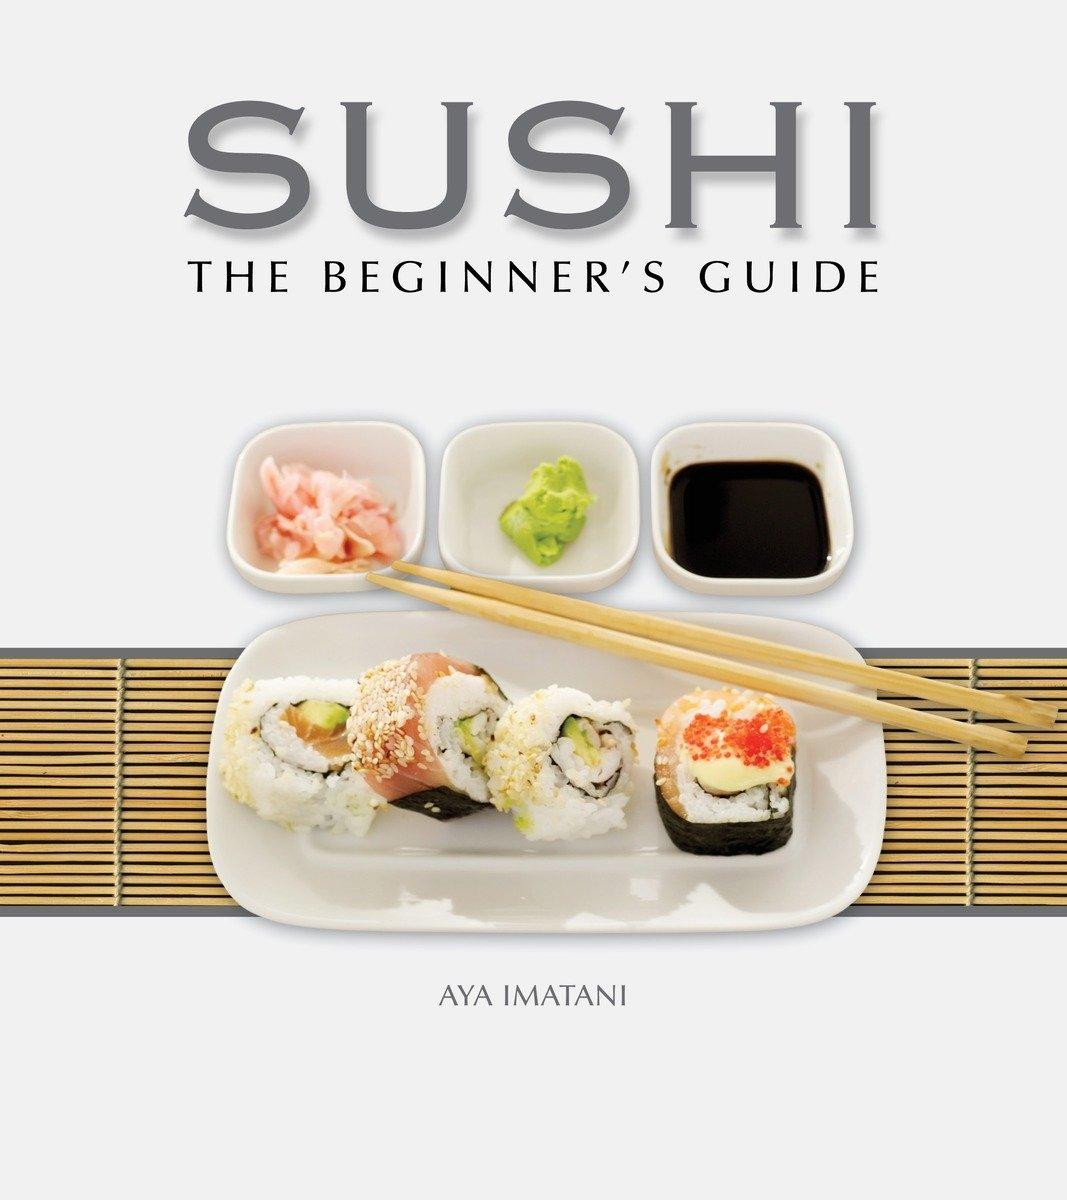 Sushi Beginners Guide Aya Imatani product image